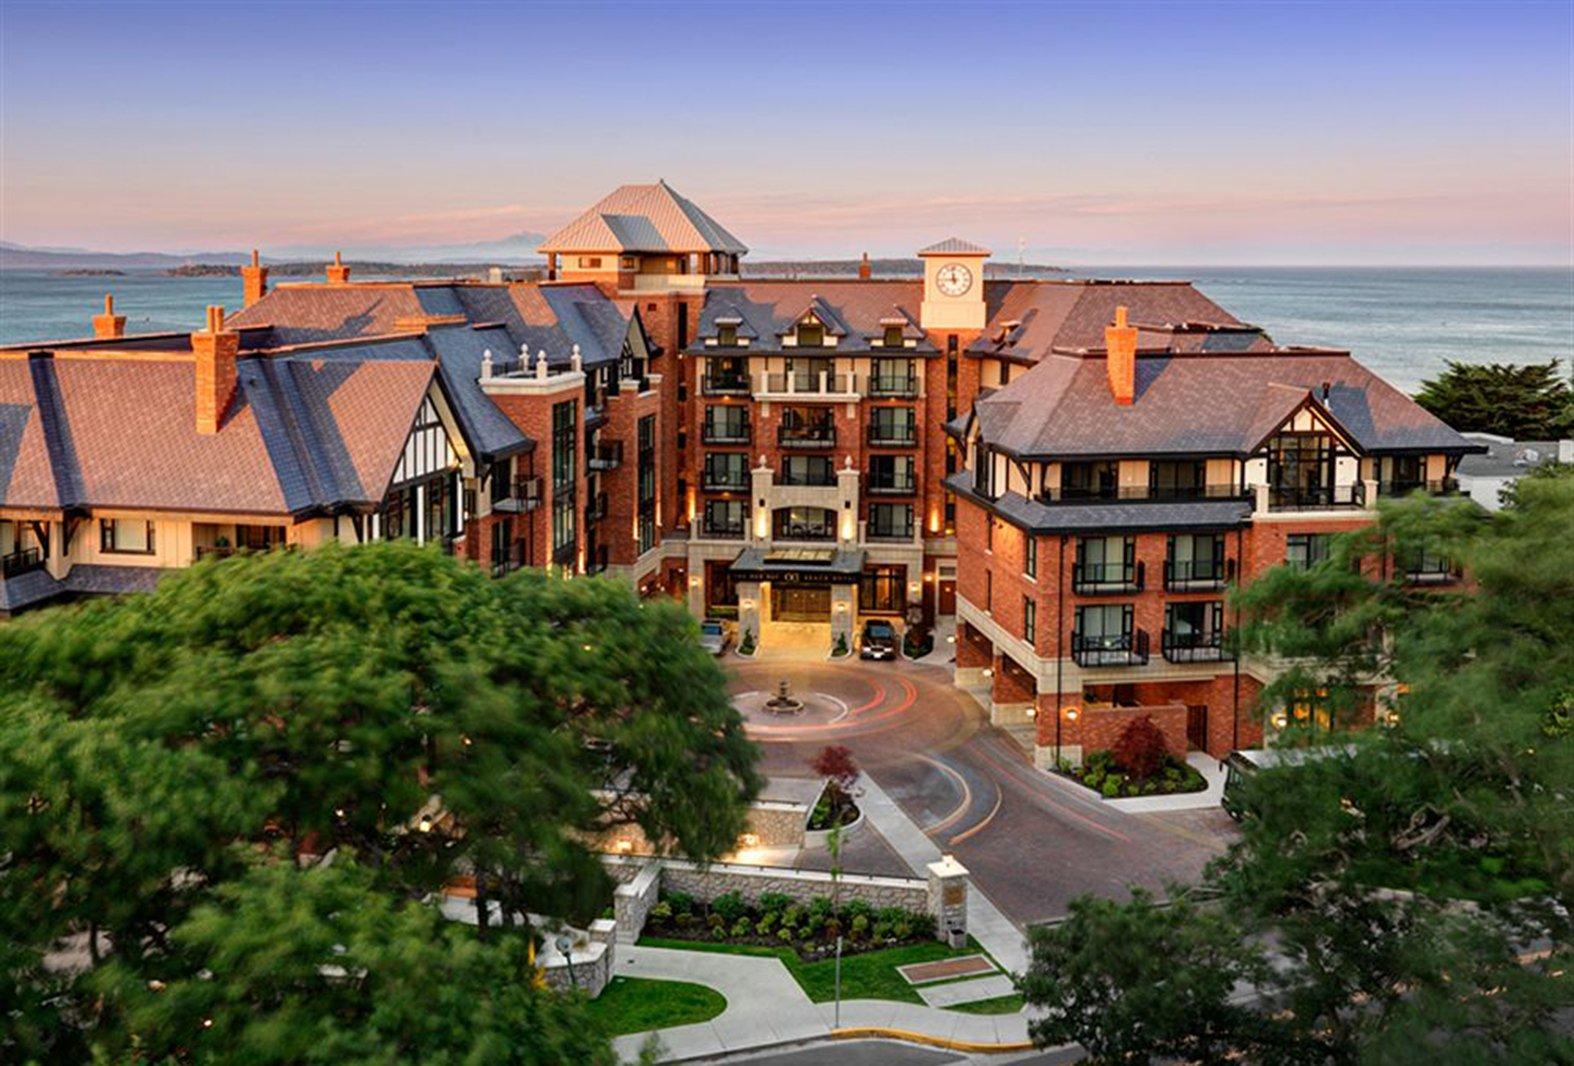 Oak Bay Beach Hotel cut#